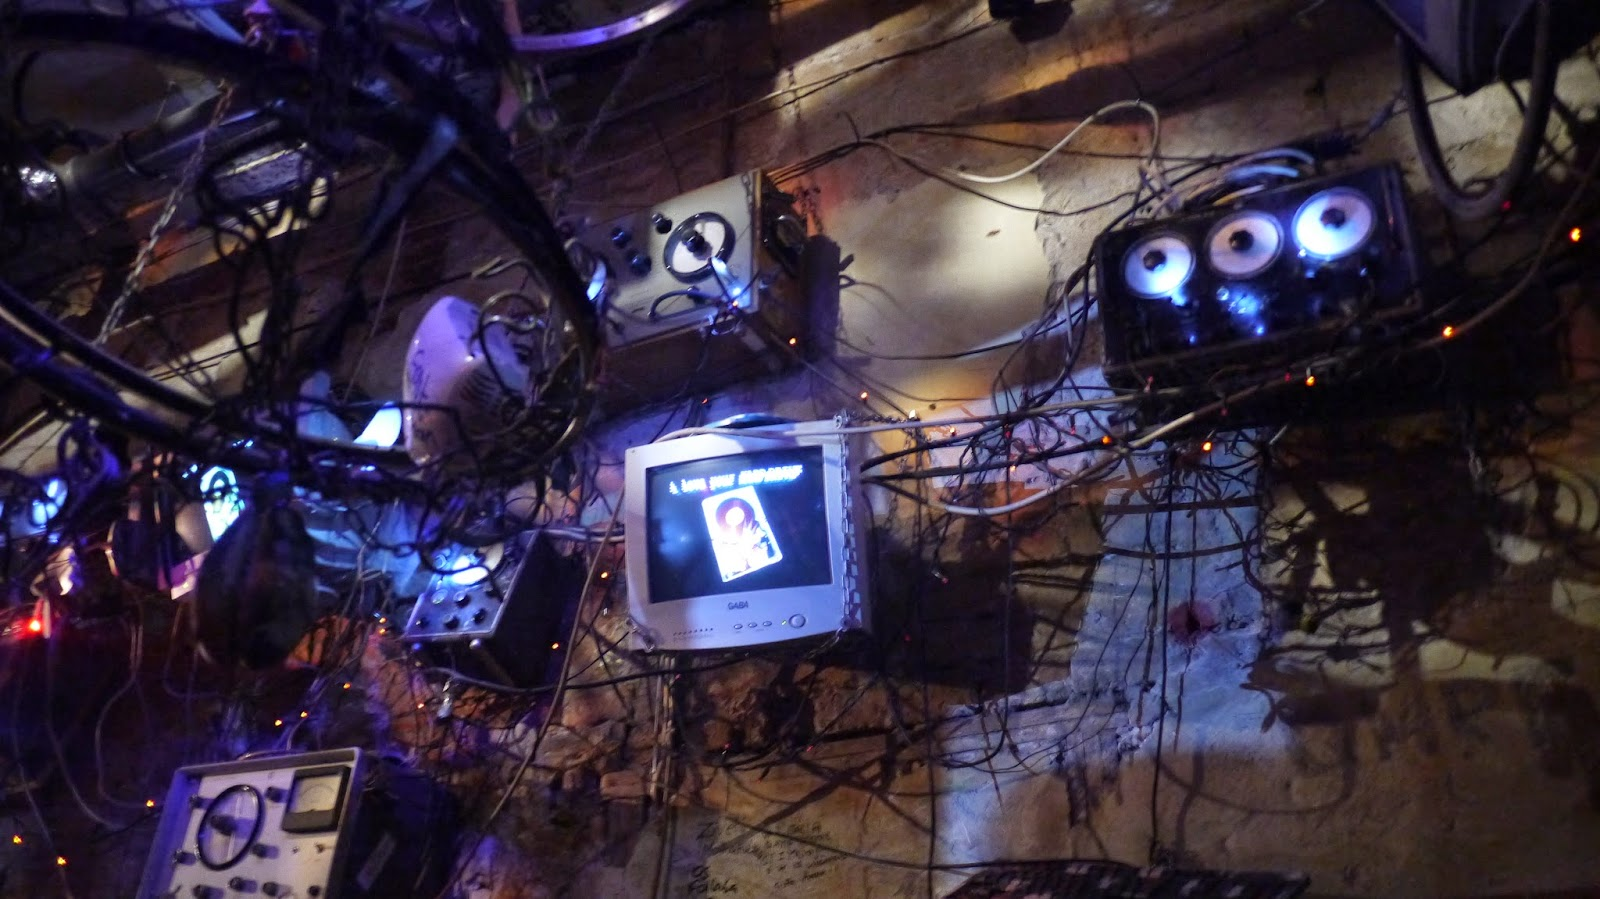 Szimpla Kert budapest ruin bar